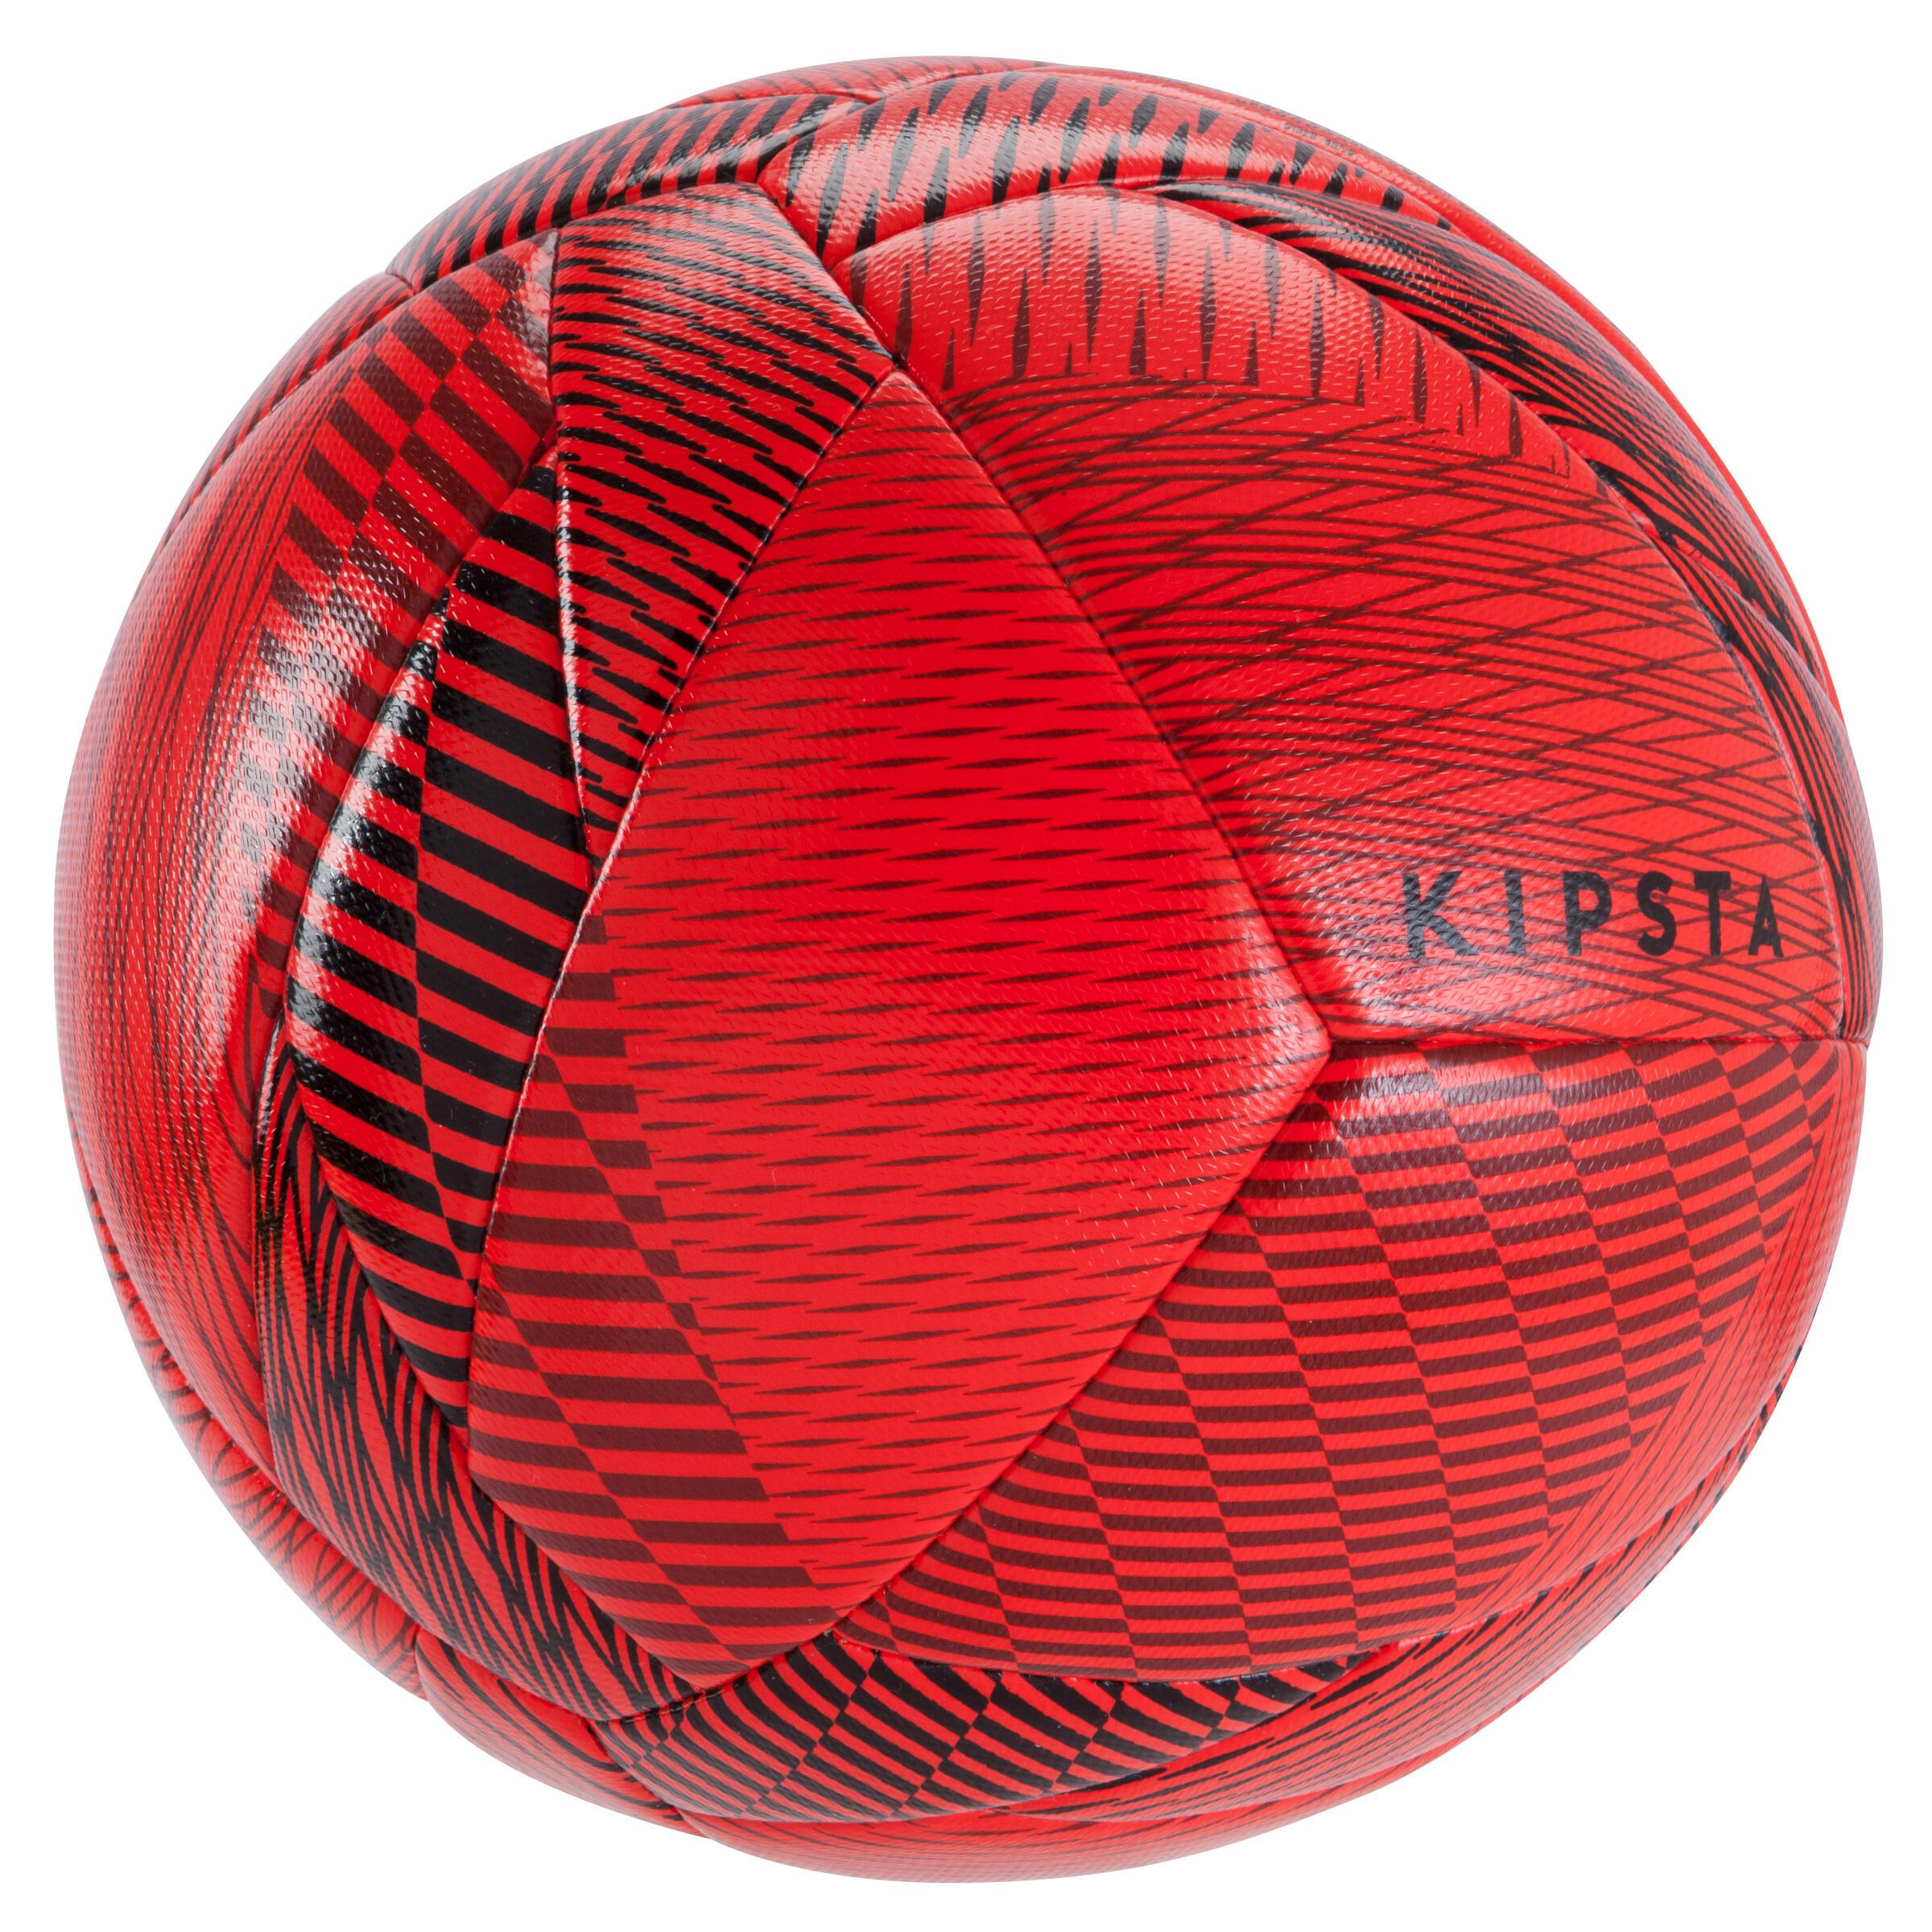 Ballon de Futsal...